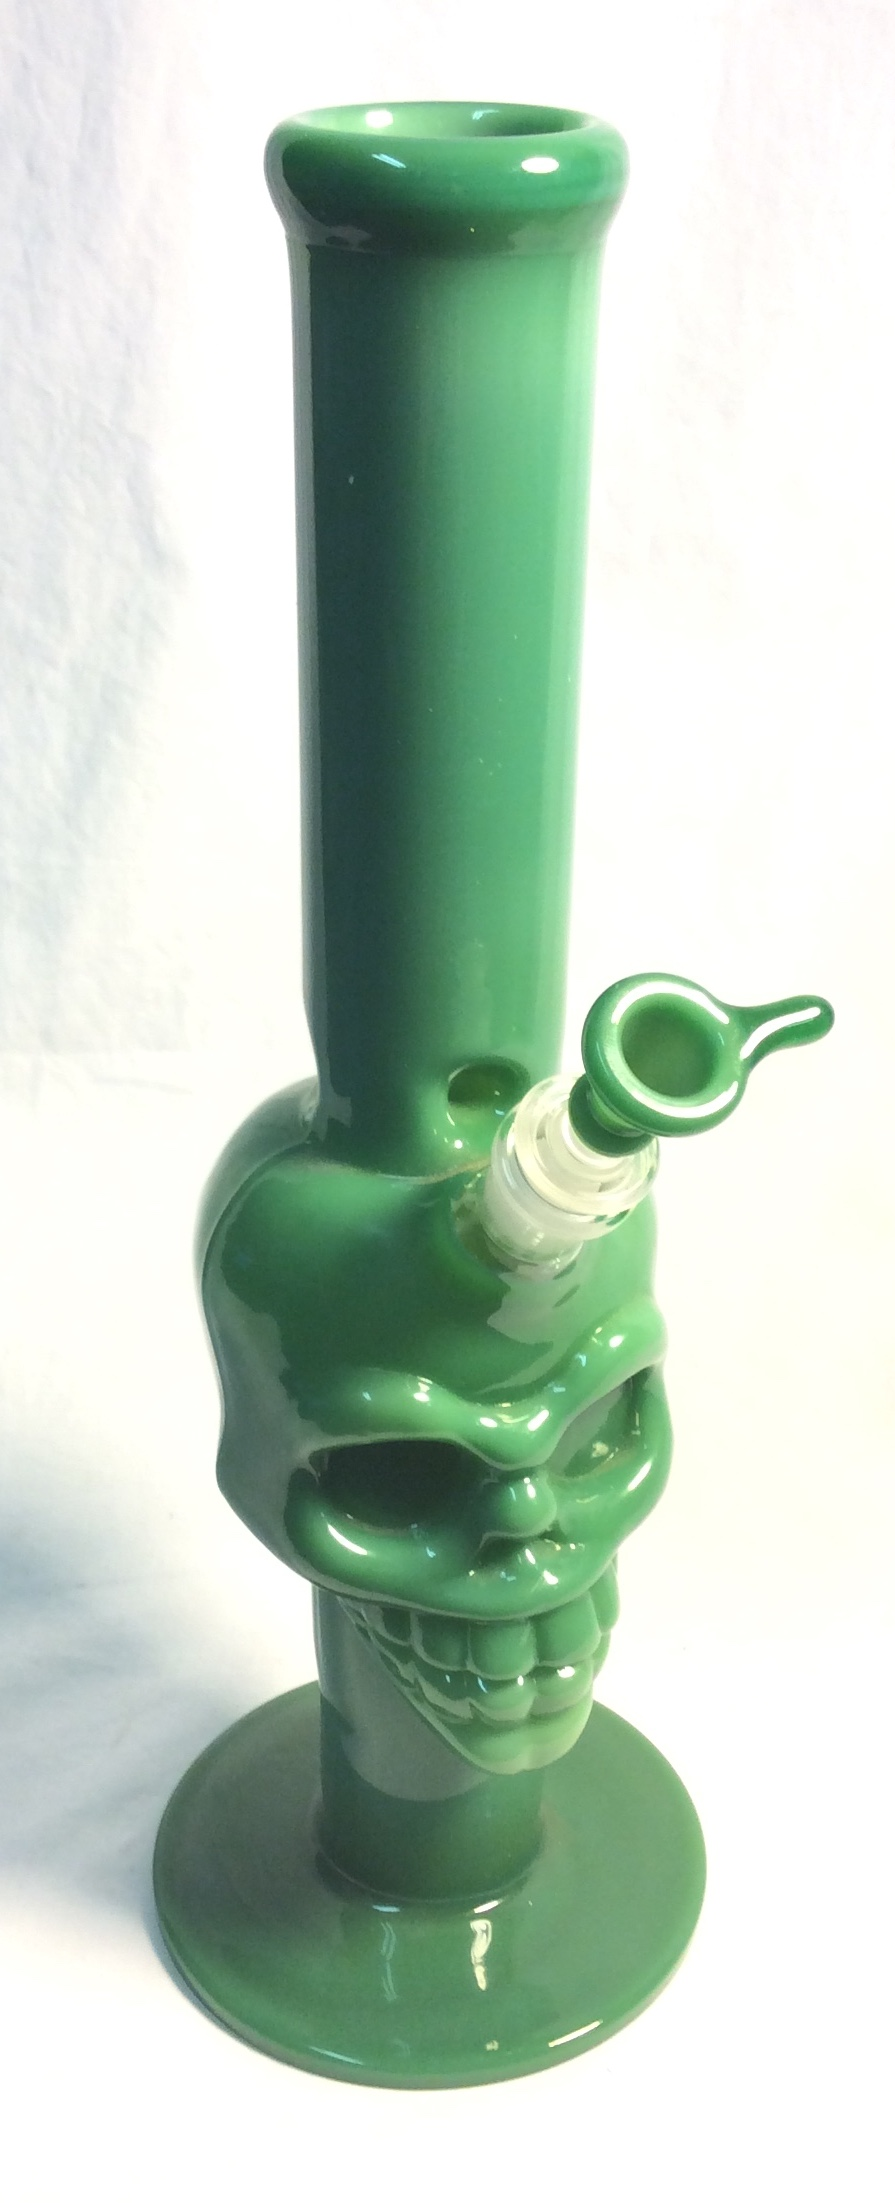 "Green glass skull bong, 15"" tall"